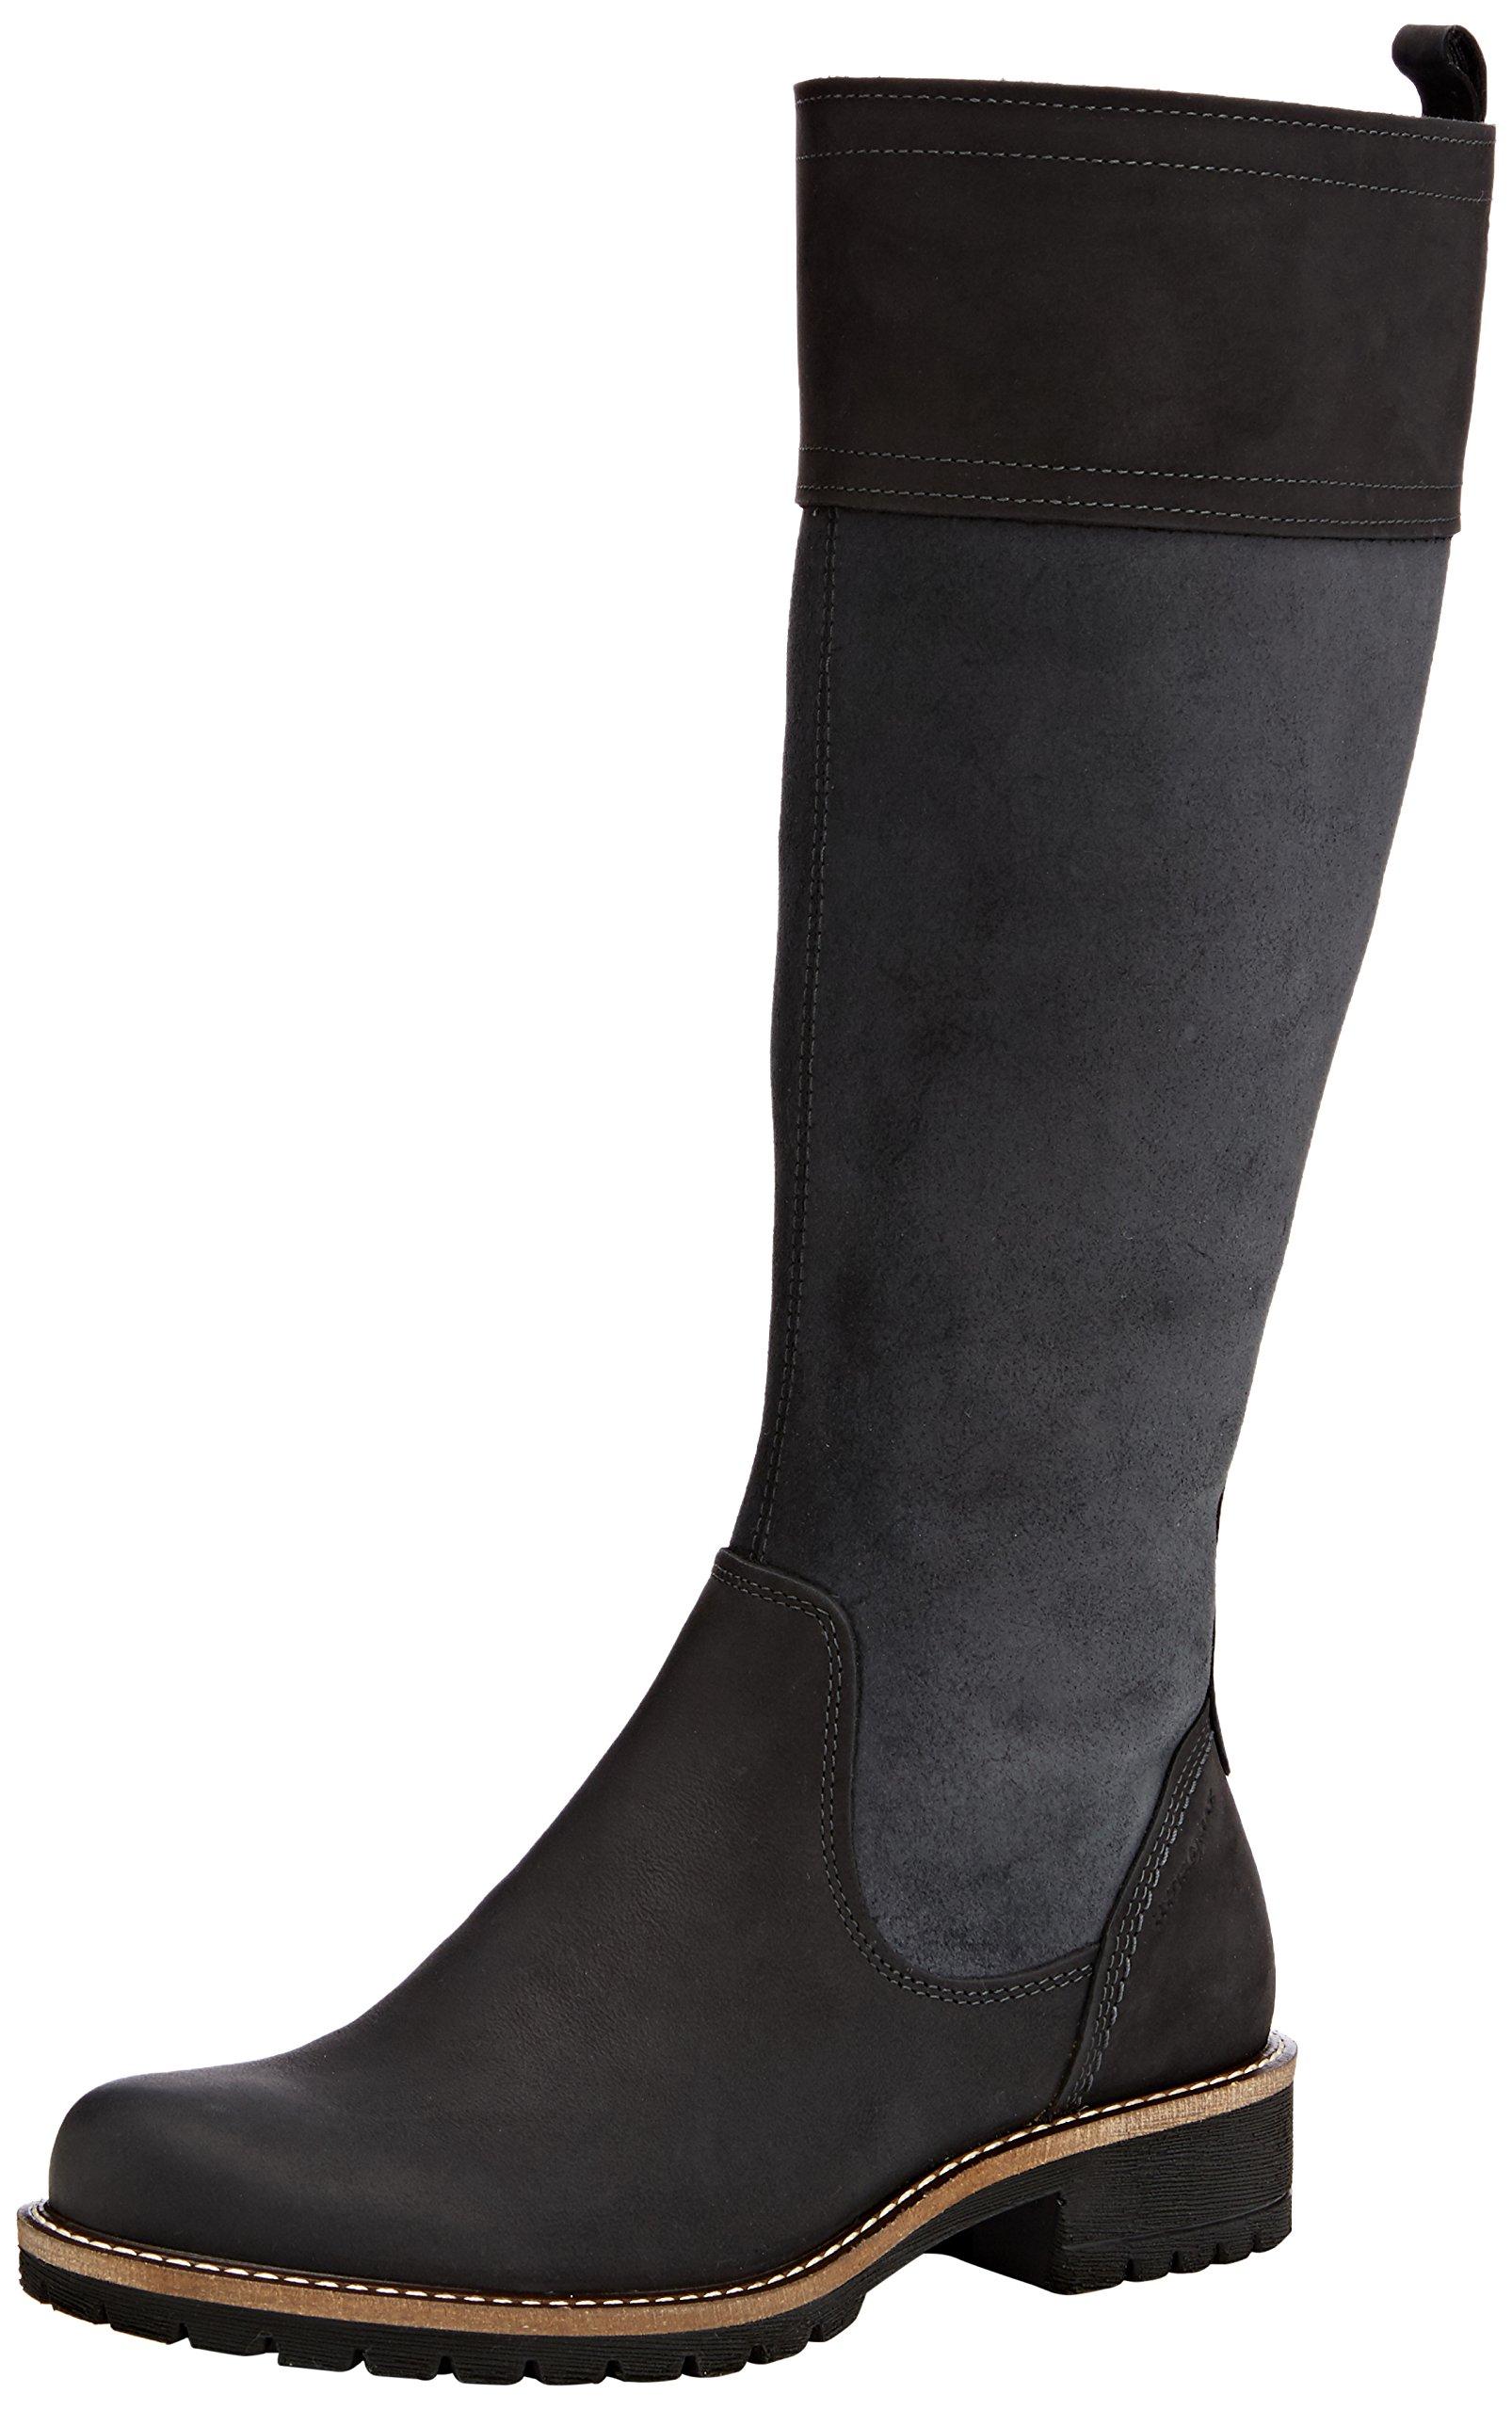 Ecco Footwear Womens Elaine Tall Boot, Black, 42 EU/11-11.5 M US